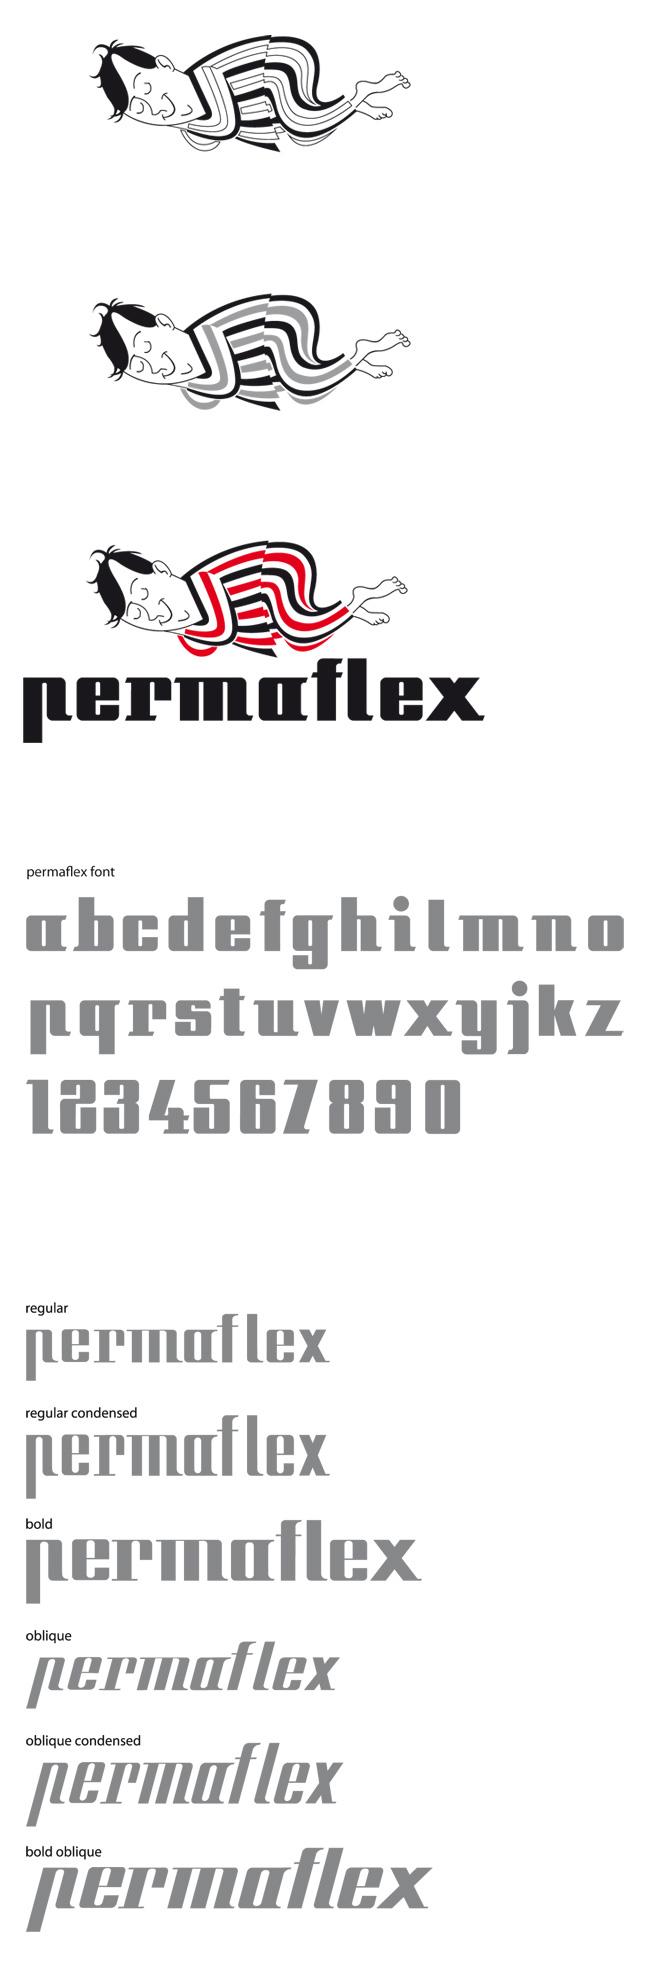 natale cardone permaflex